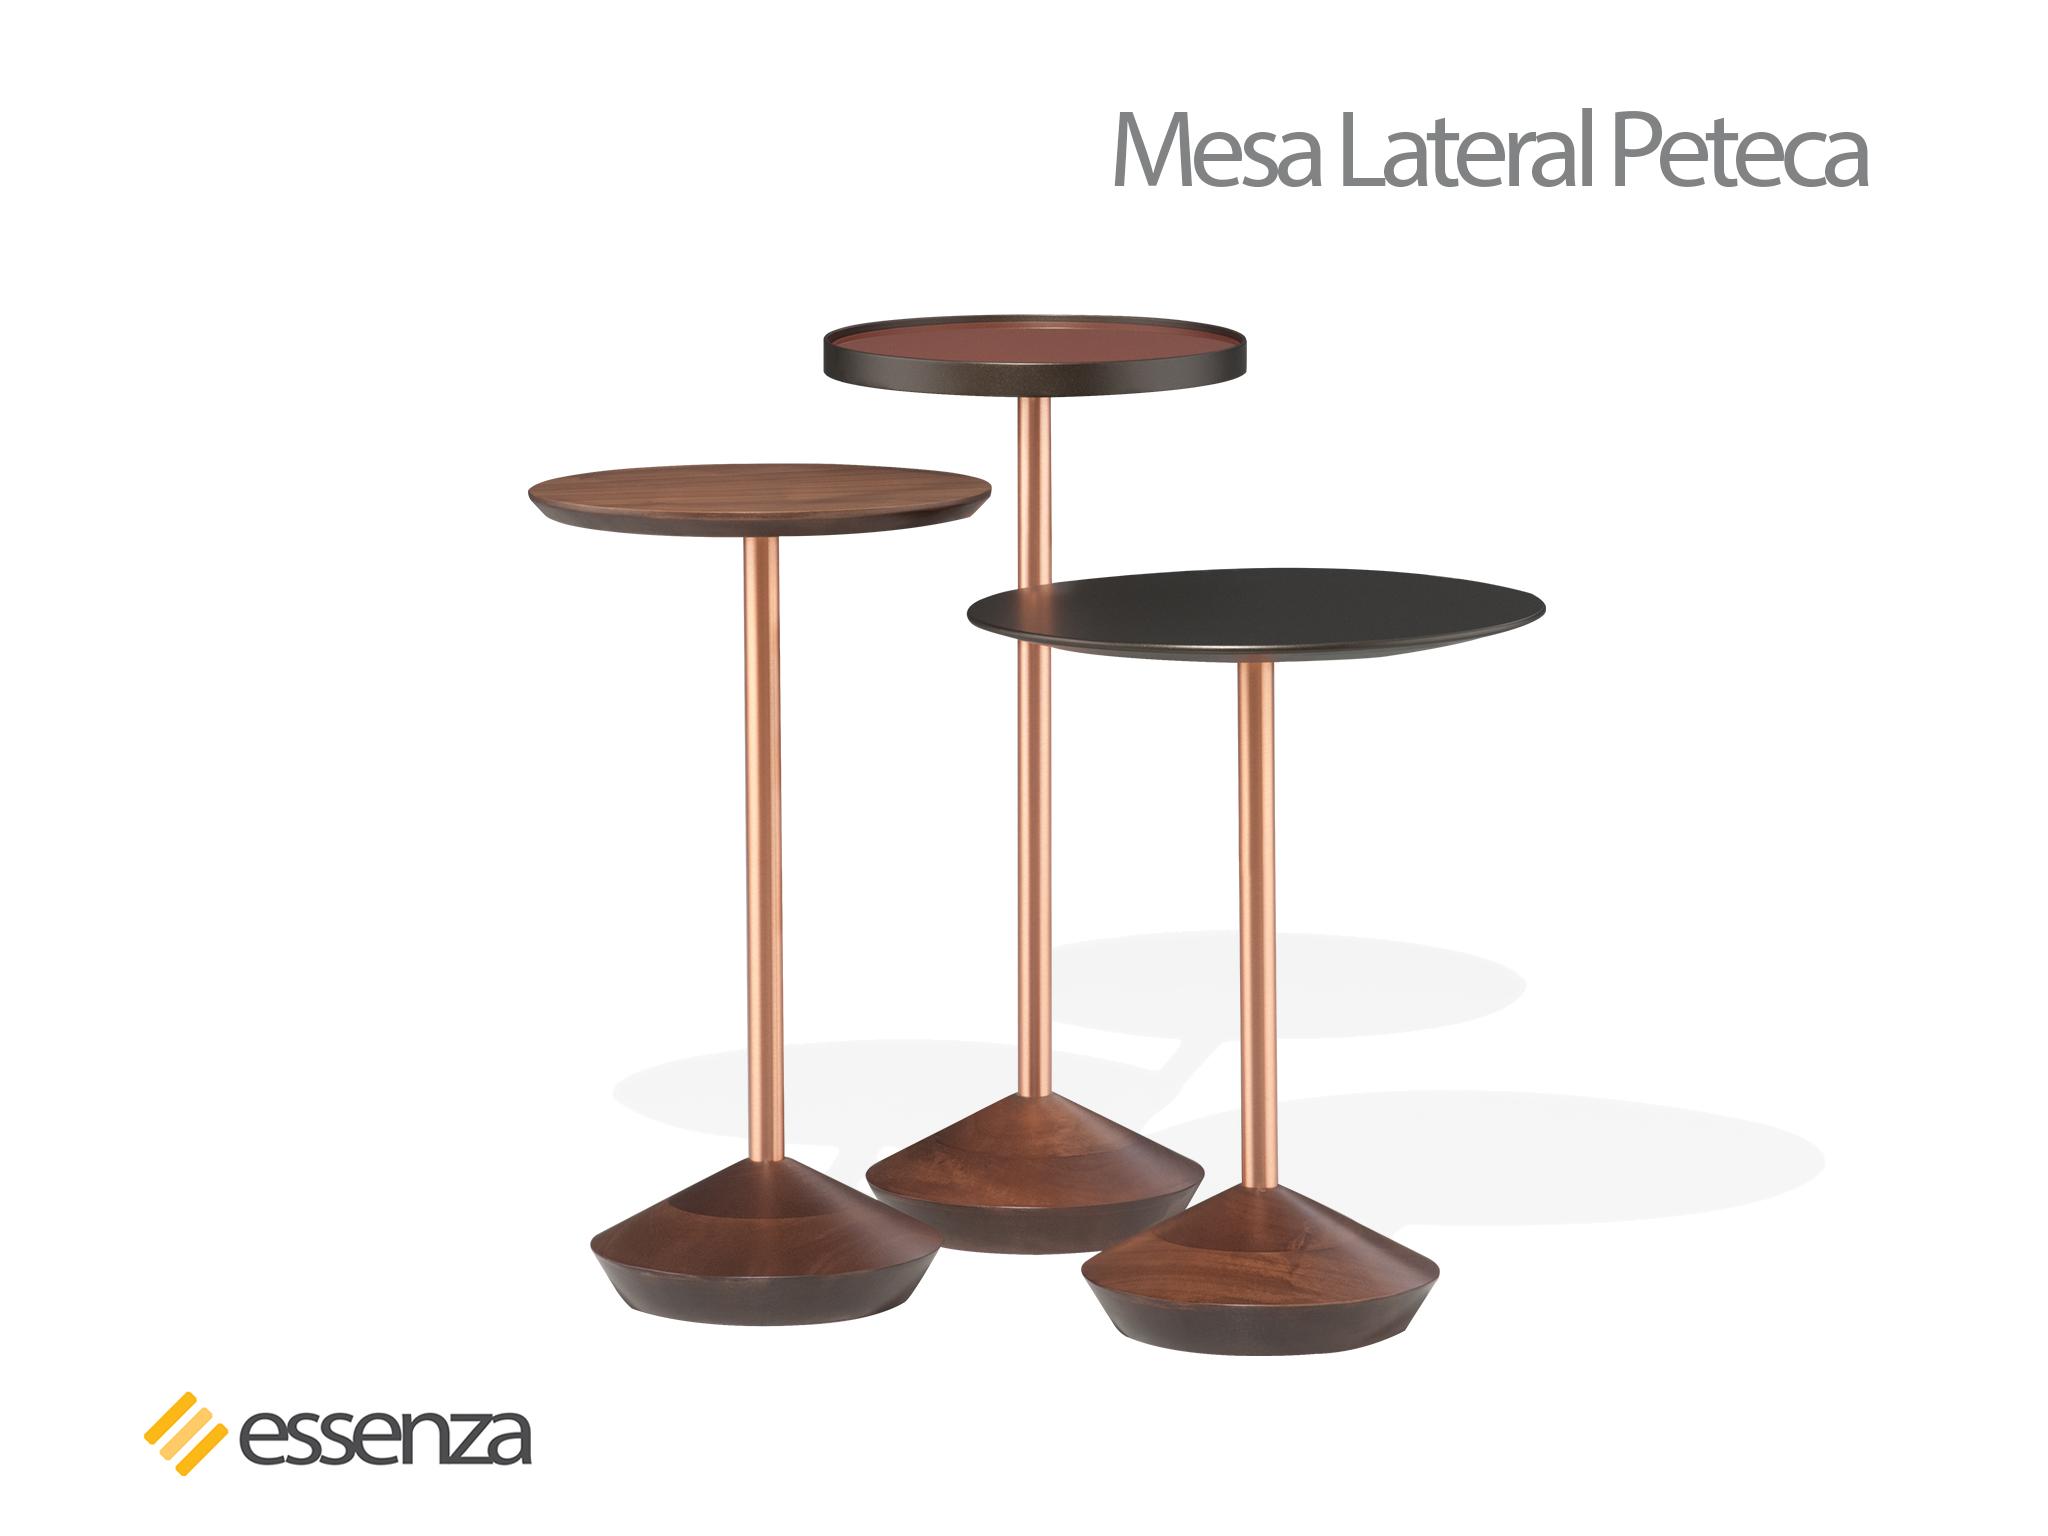 Essenza_Mesa Lateral_ml_peteca_4.jpg